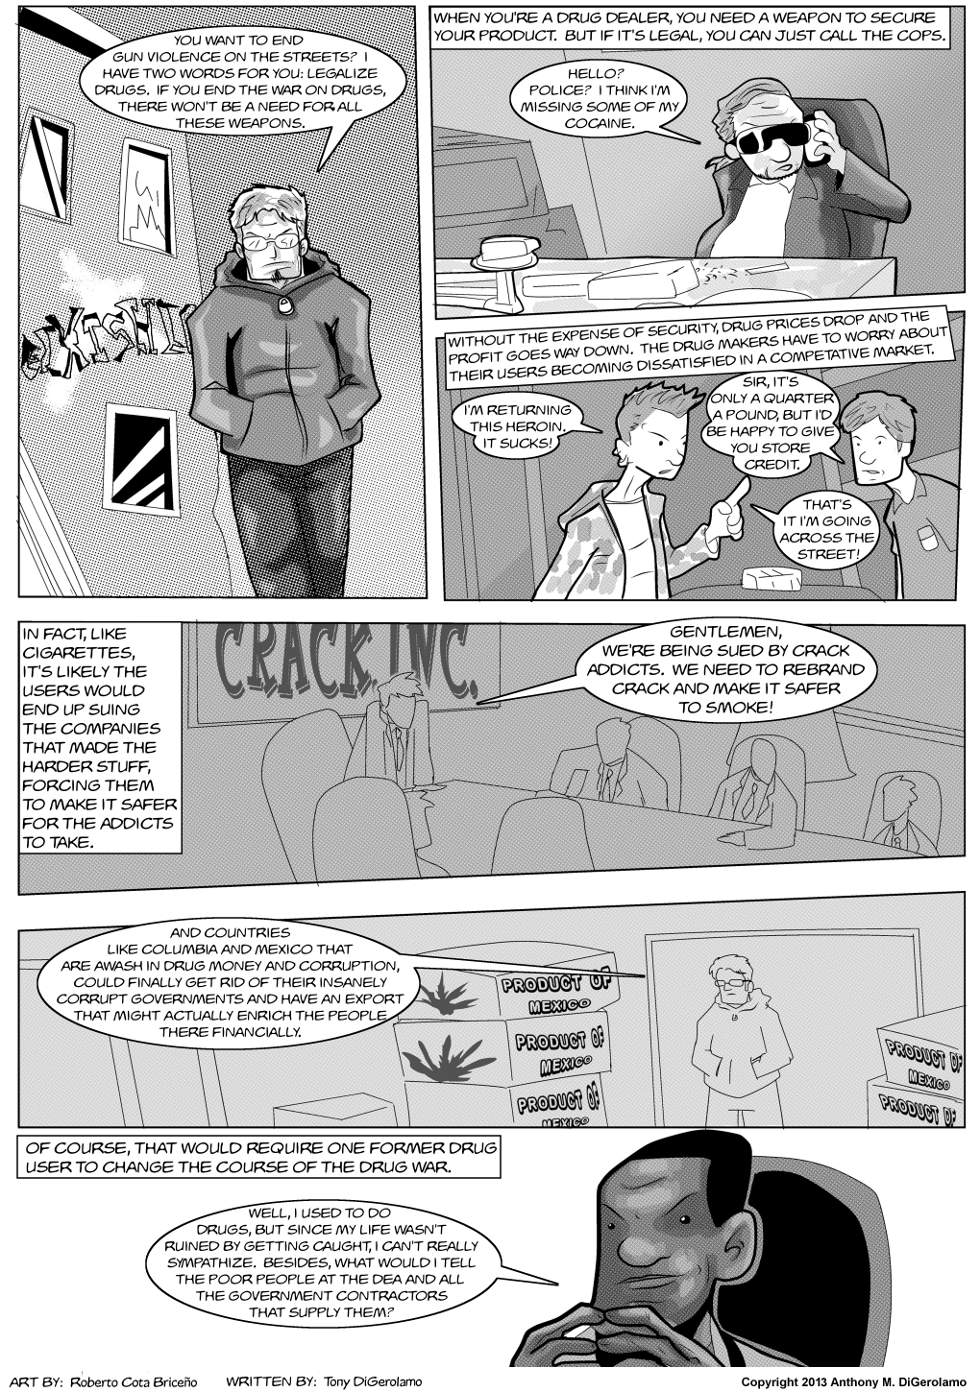 The Antiwar Comic:  The Gun Solution